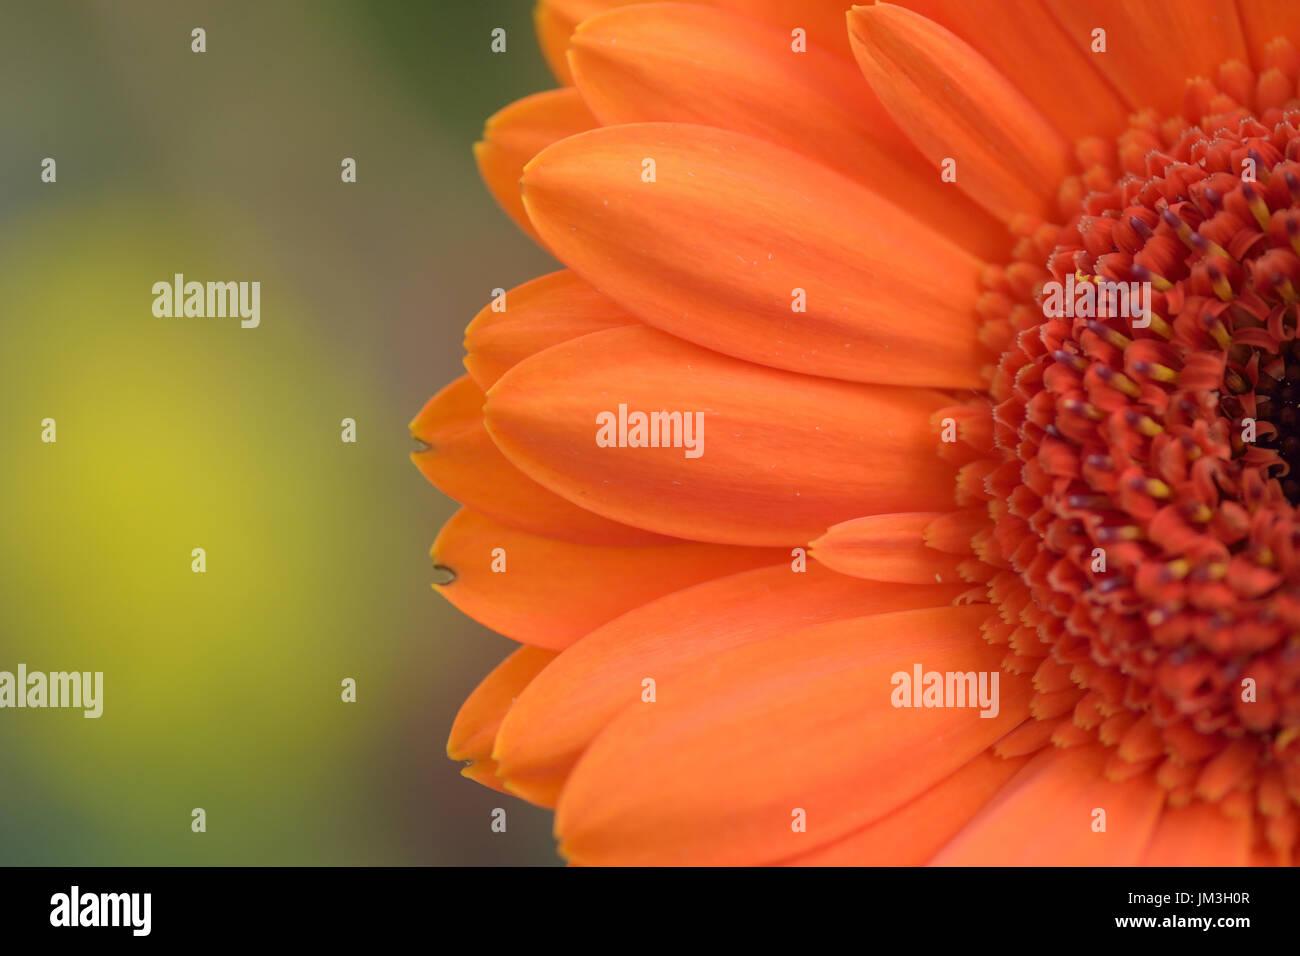 Macro detalles de color naranja, Flor de Margarita en bastidor horizontal Imagen De Stock